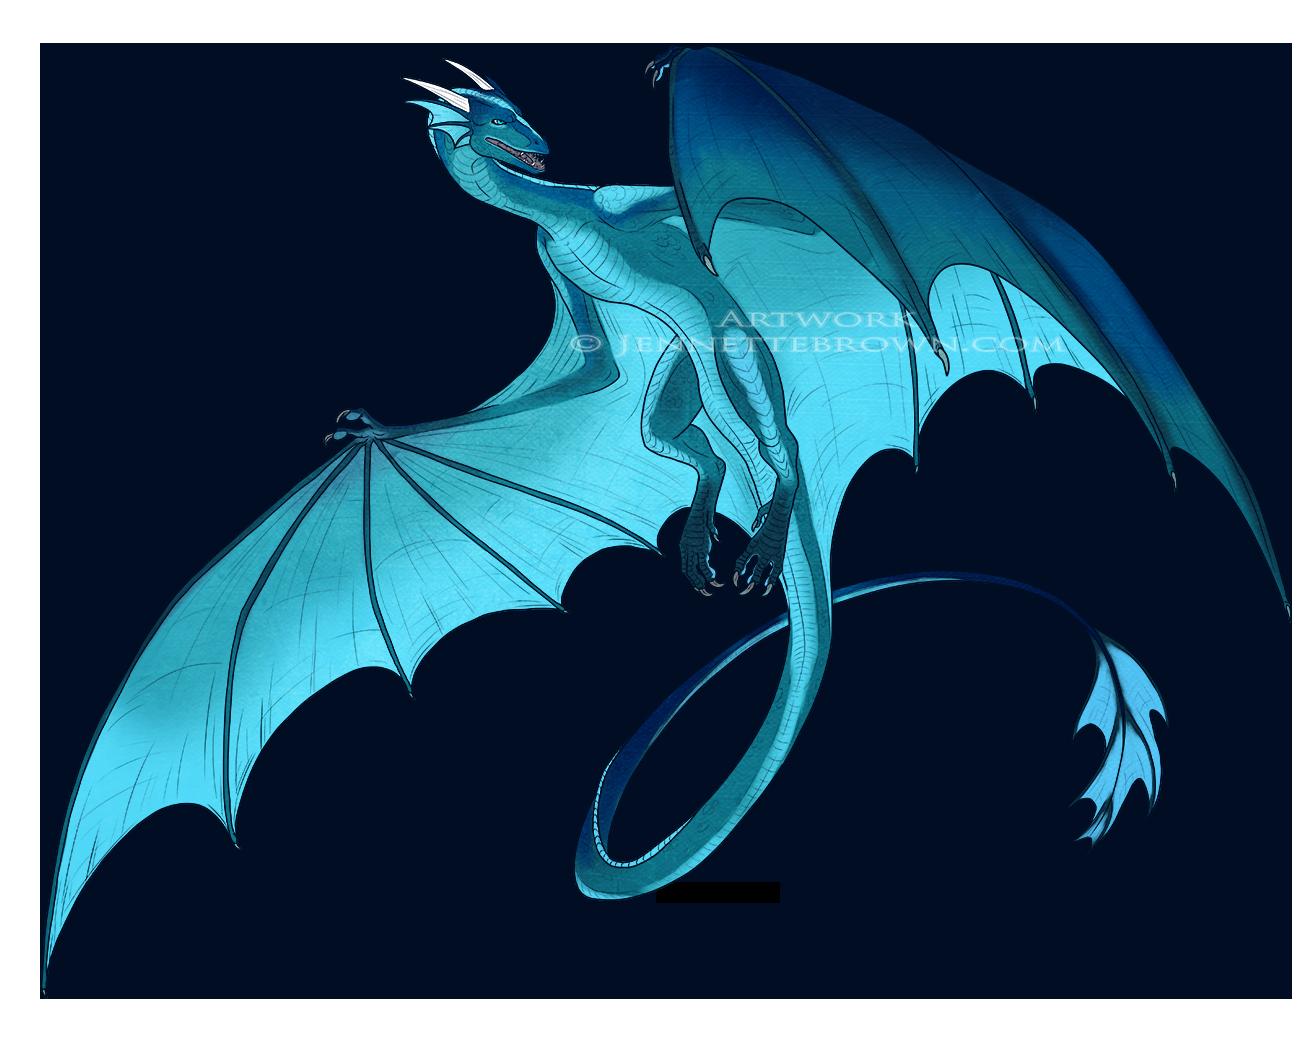 Wyvern Dragon: SomemuttupNorth Wyvern Commission By Sugarpoultry On